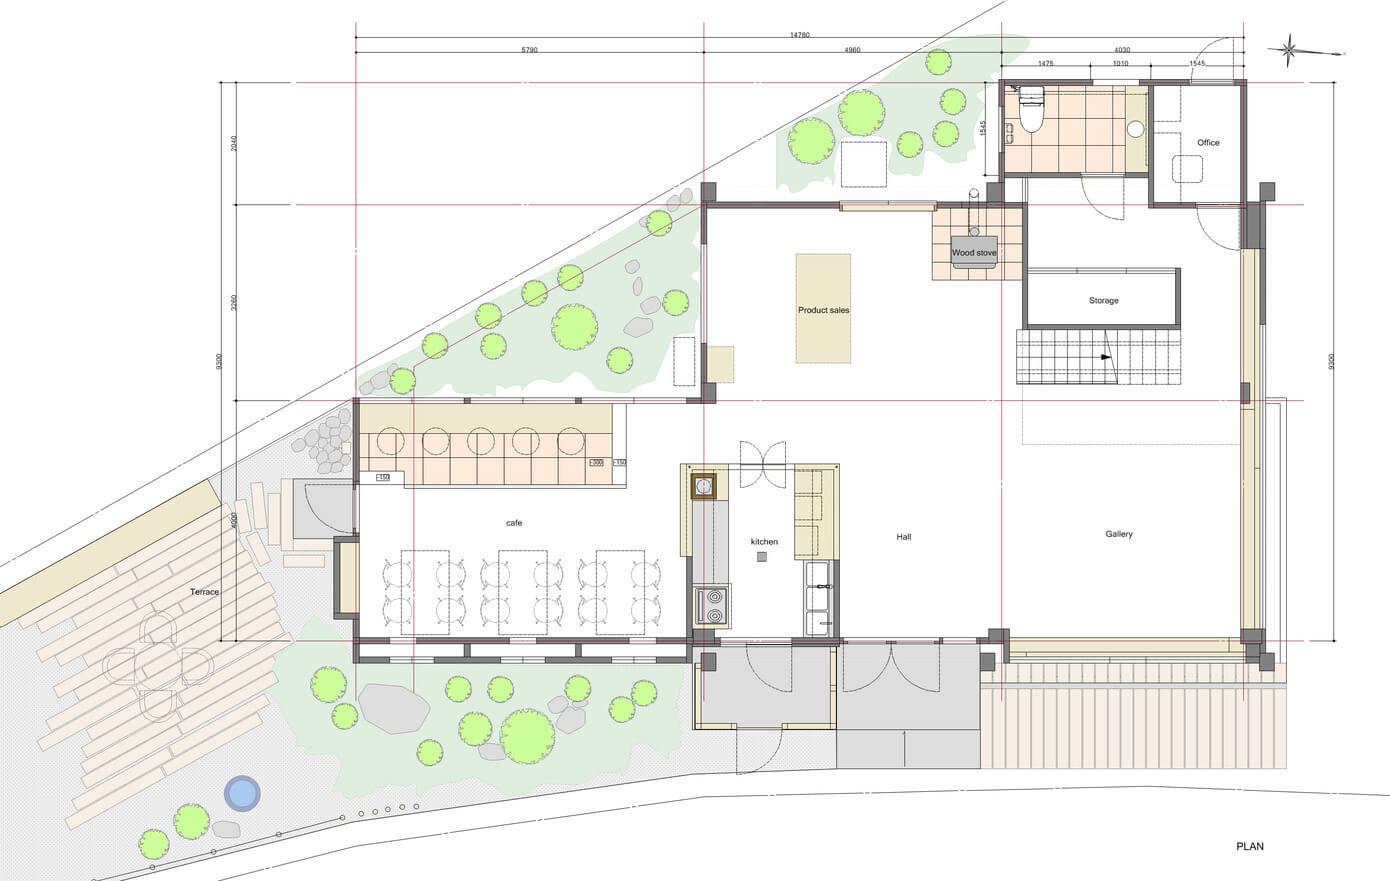 satoduto-coil-kazuteru-matumura-architects-20